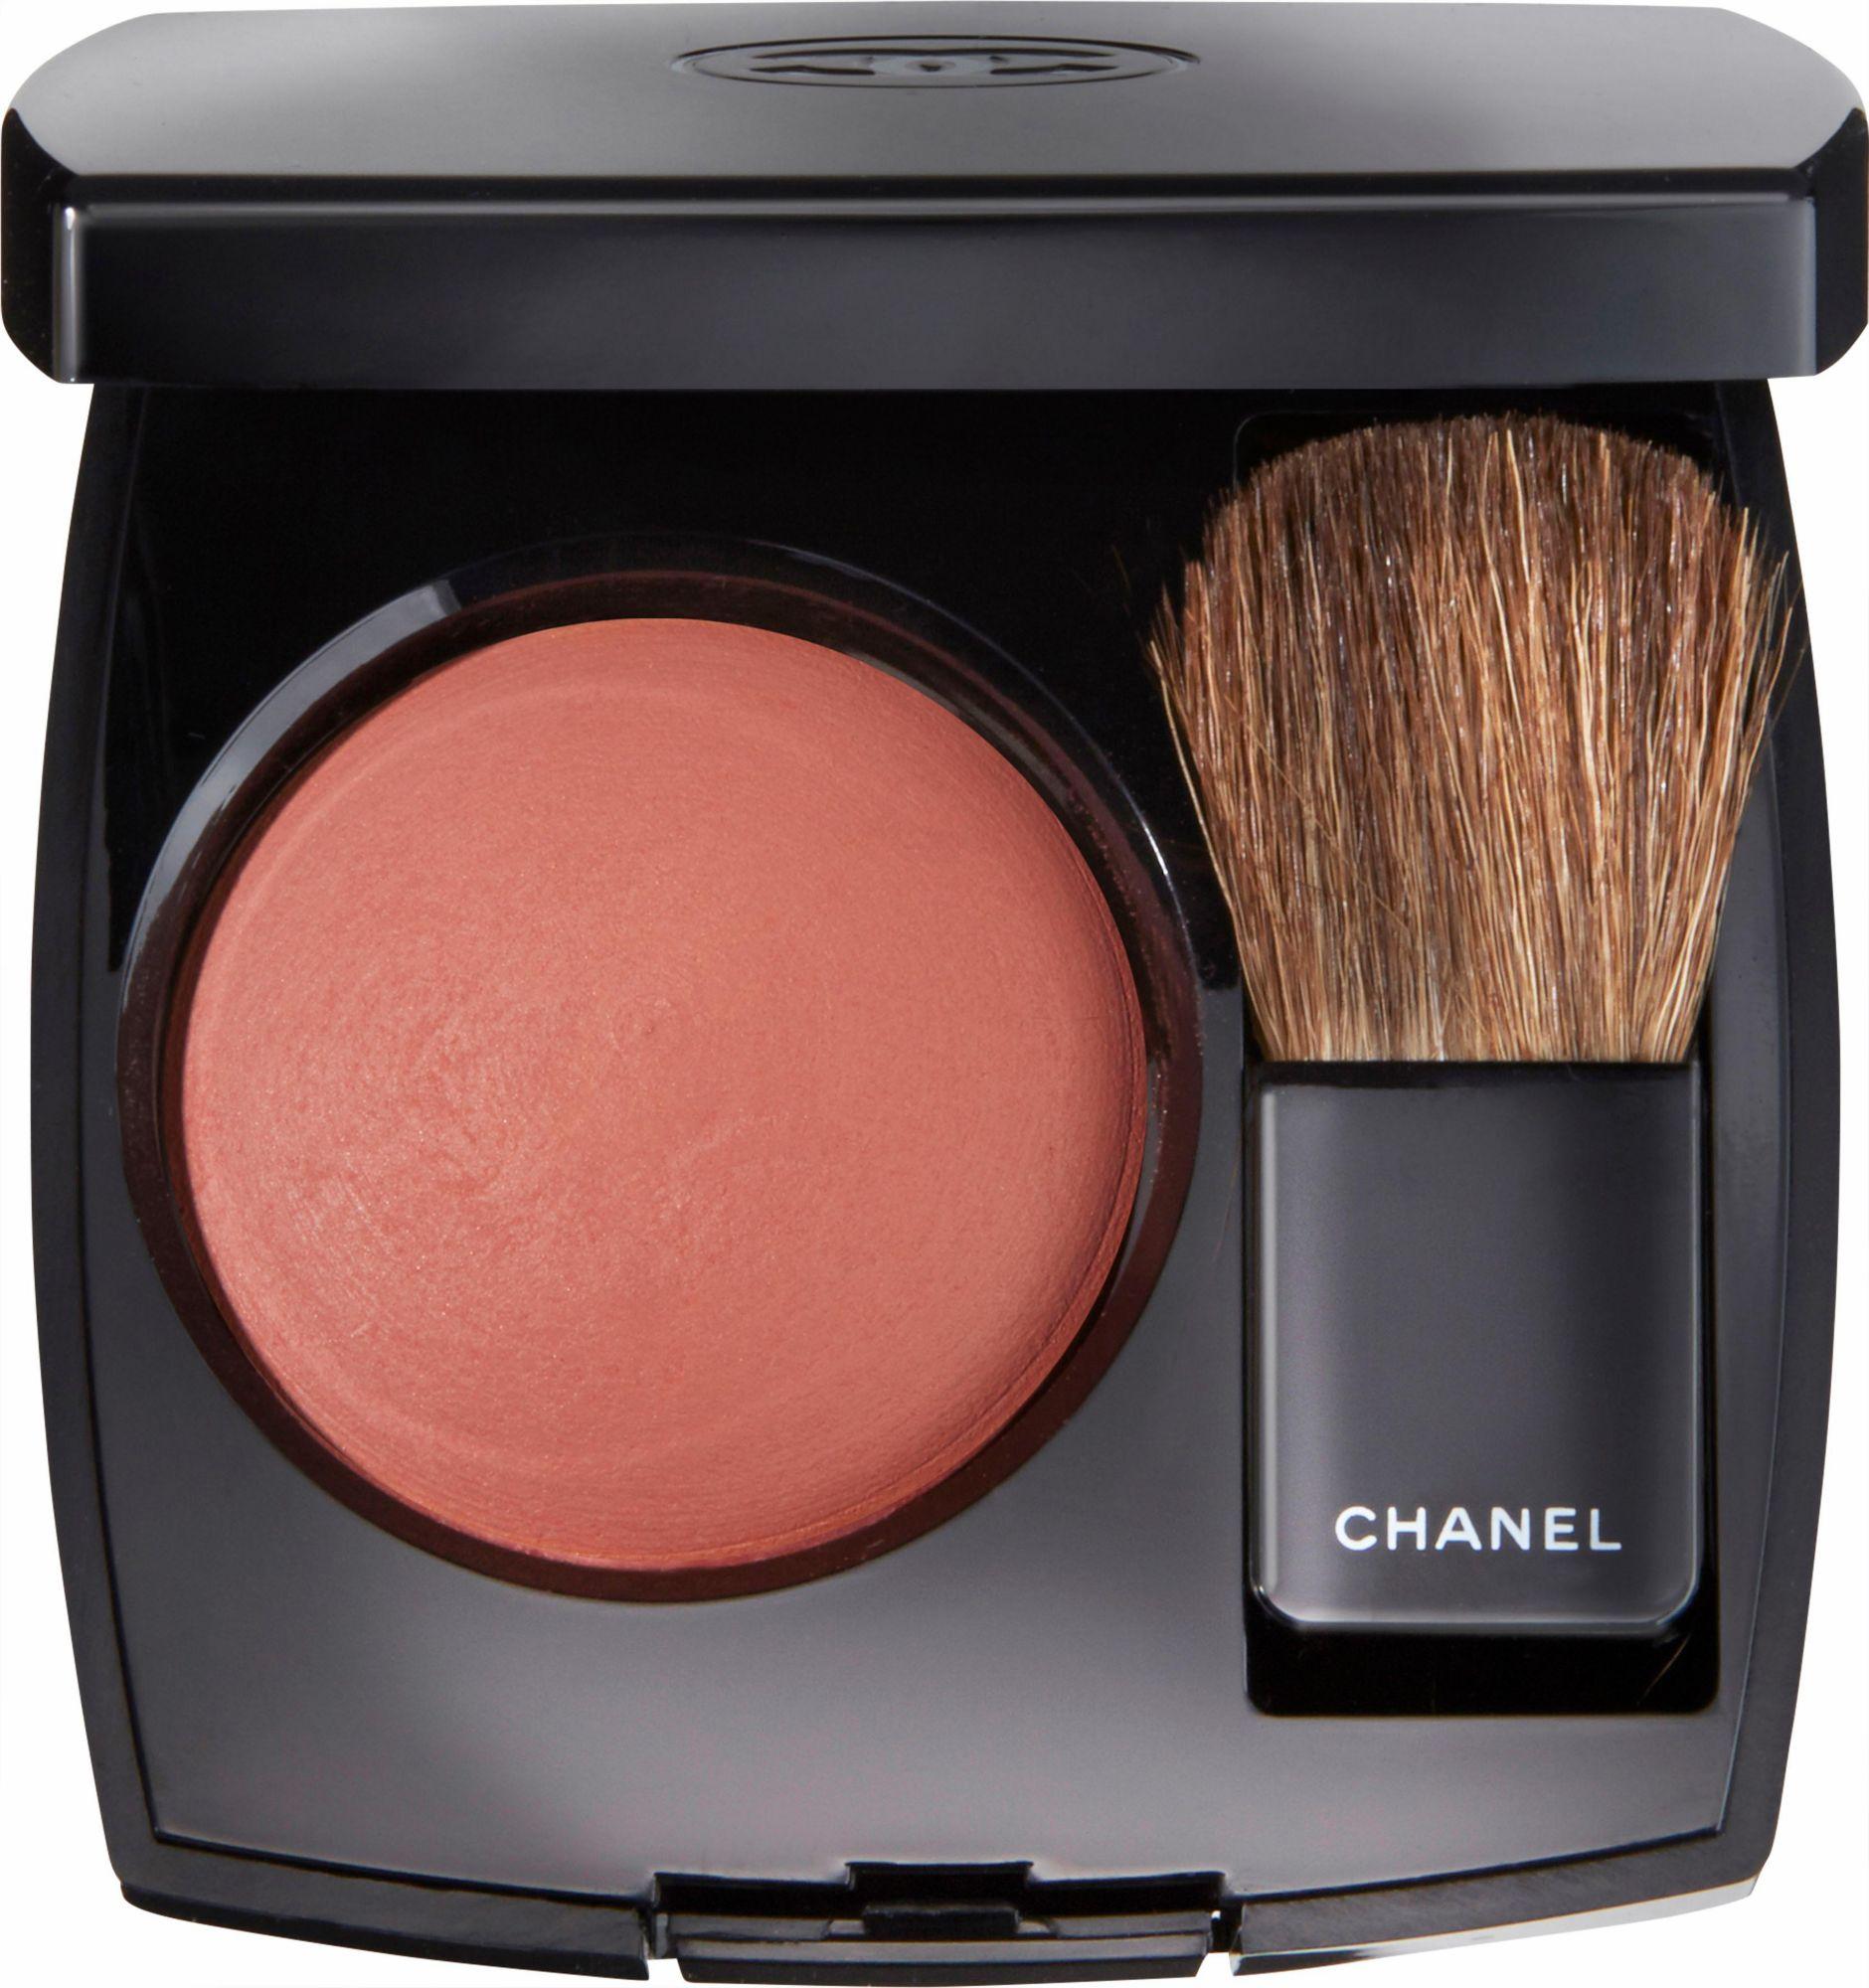 CHANEL Chanel, »Joues Contraste«, Rouge